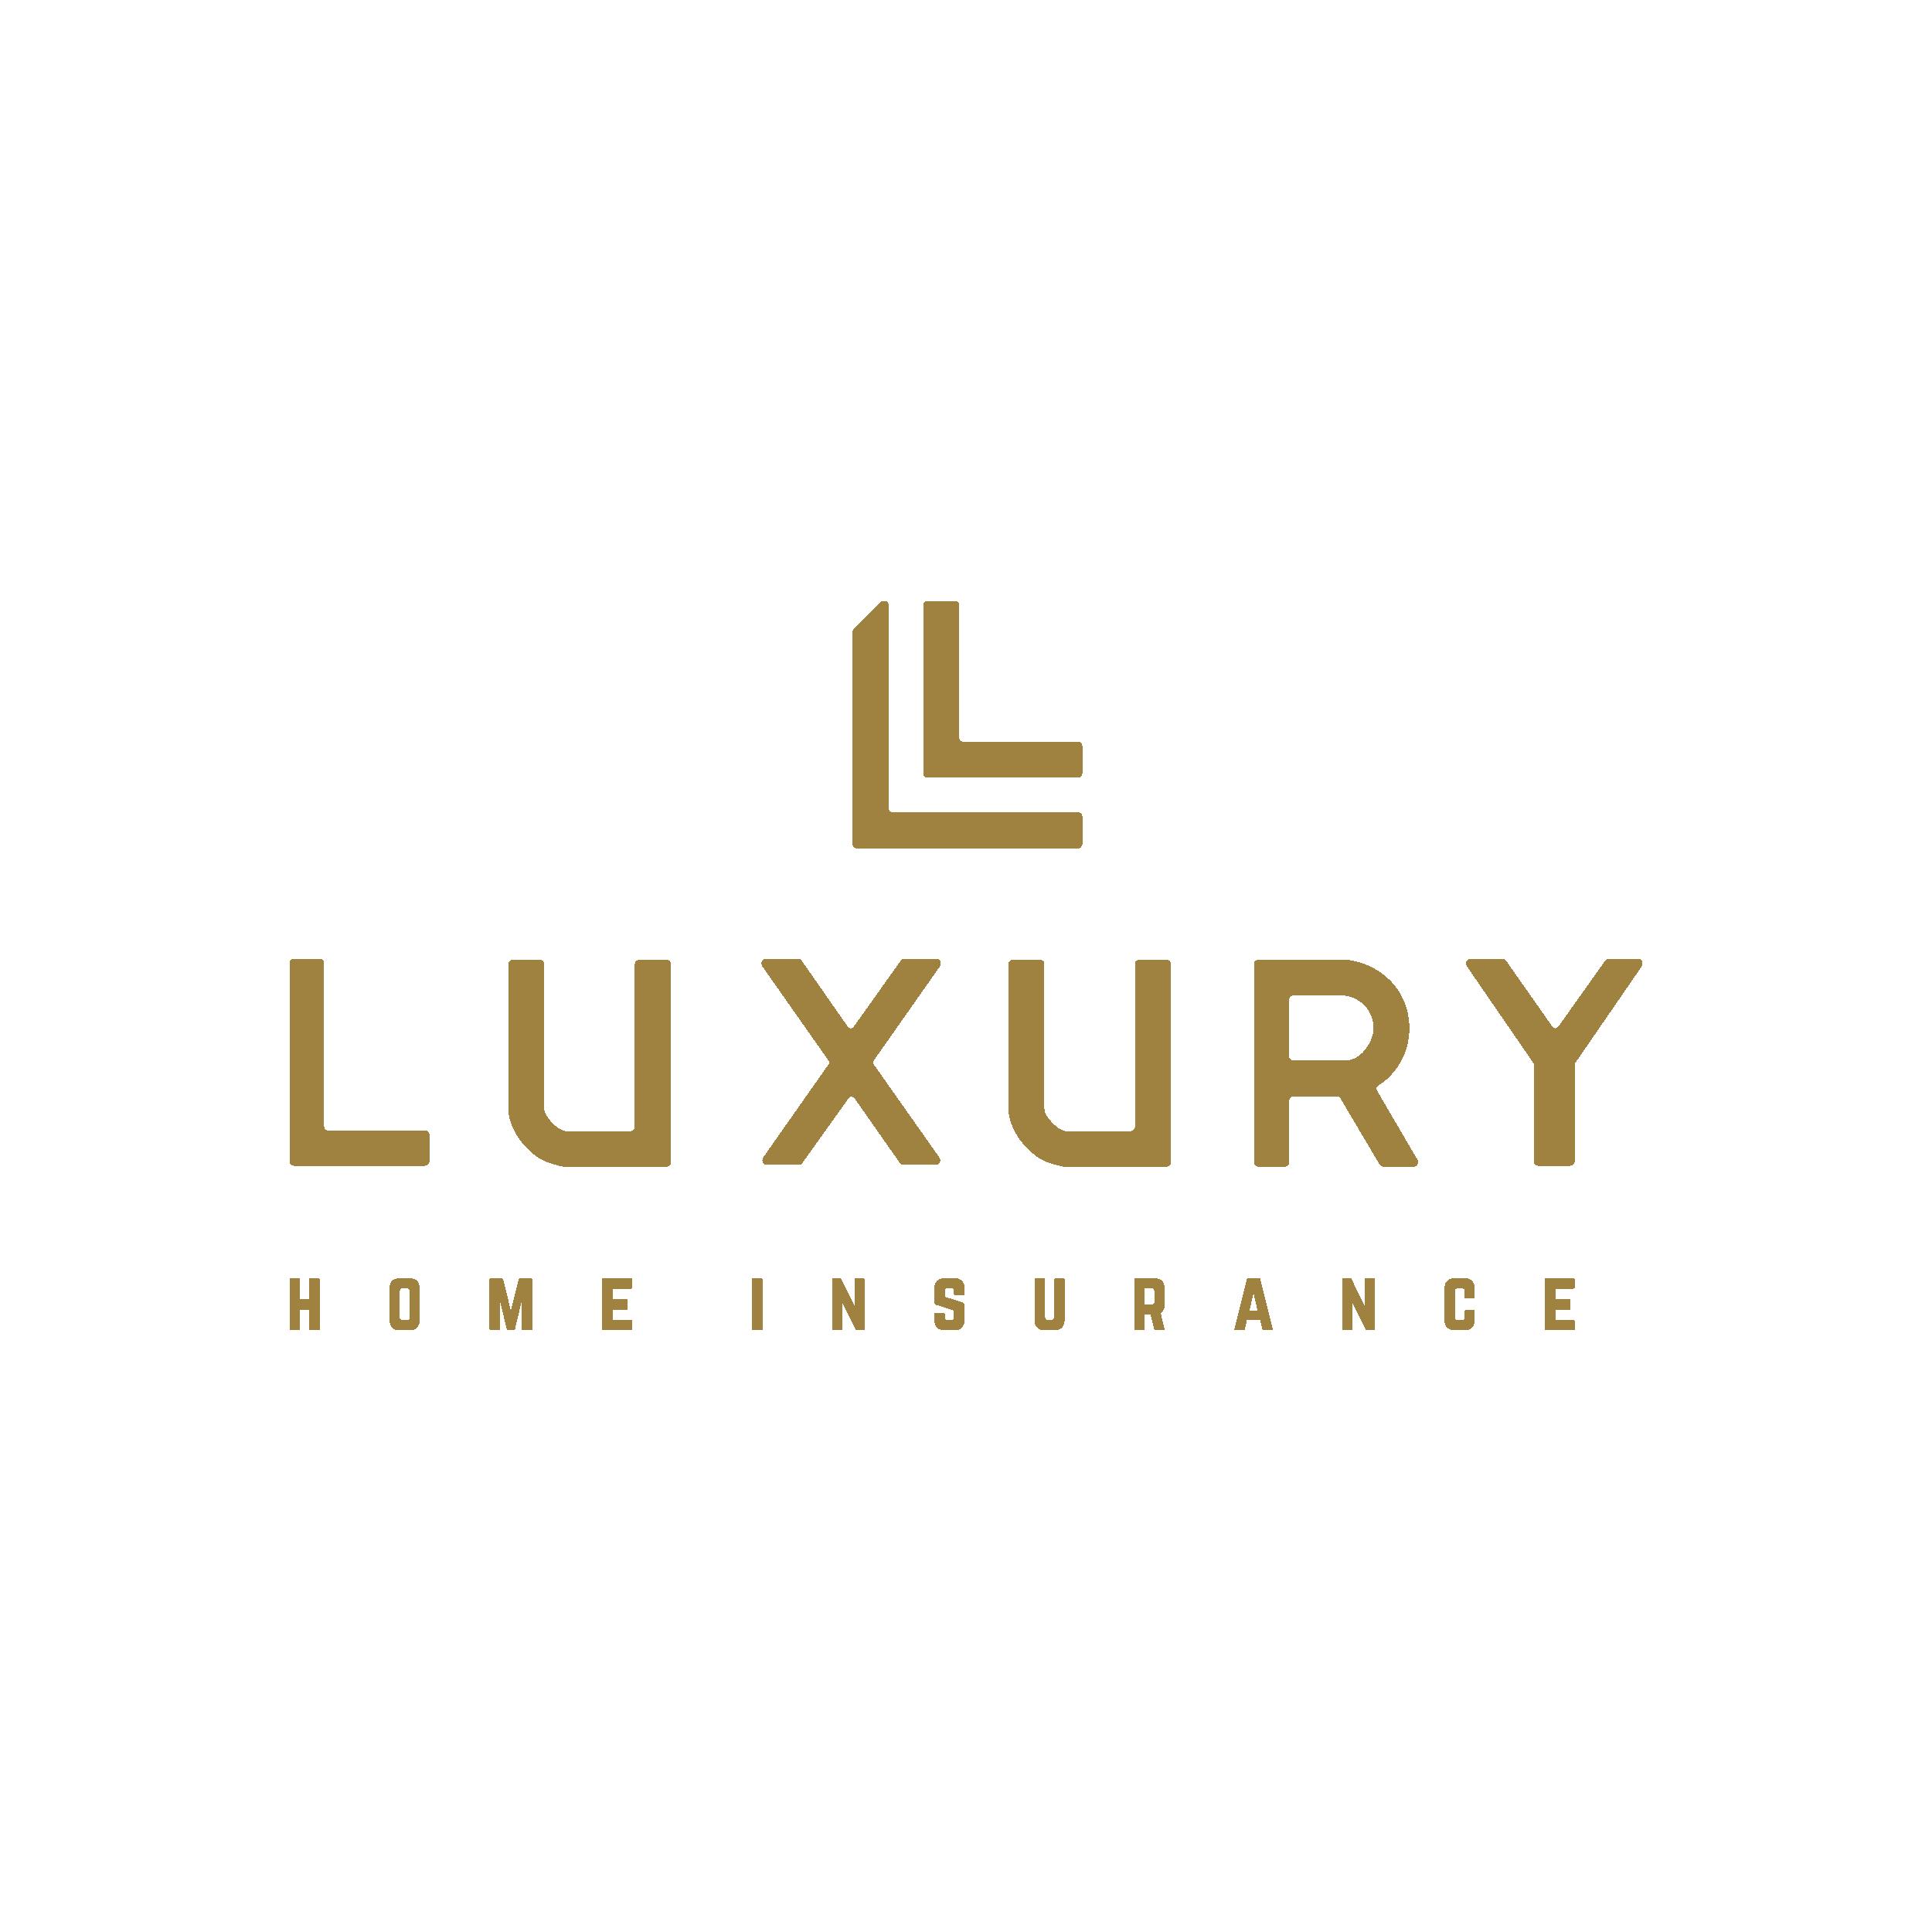 Luxury Home Insurance